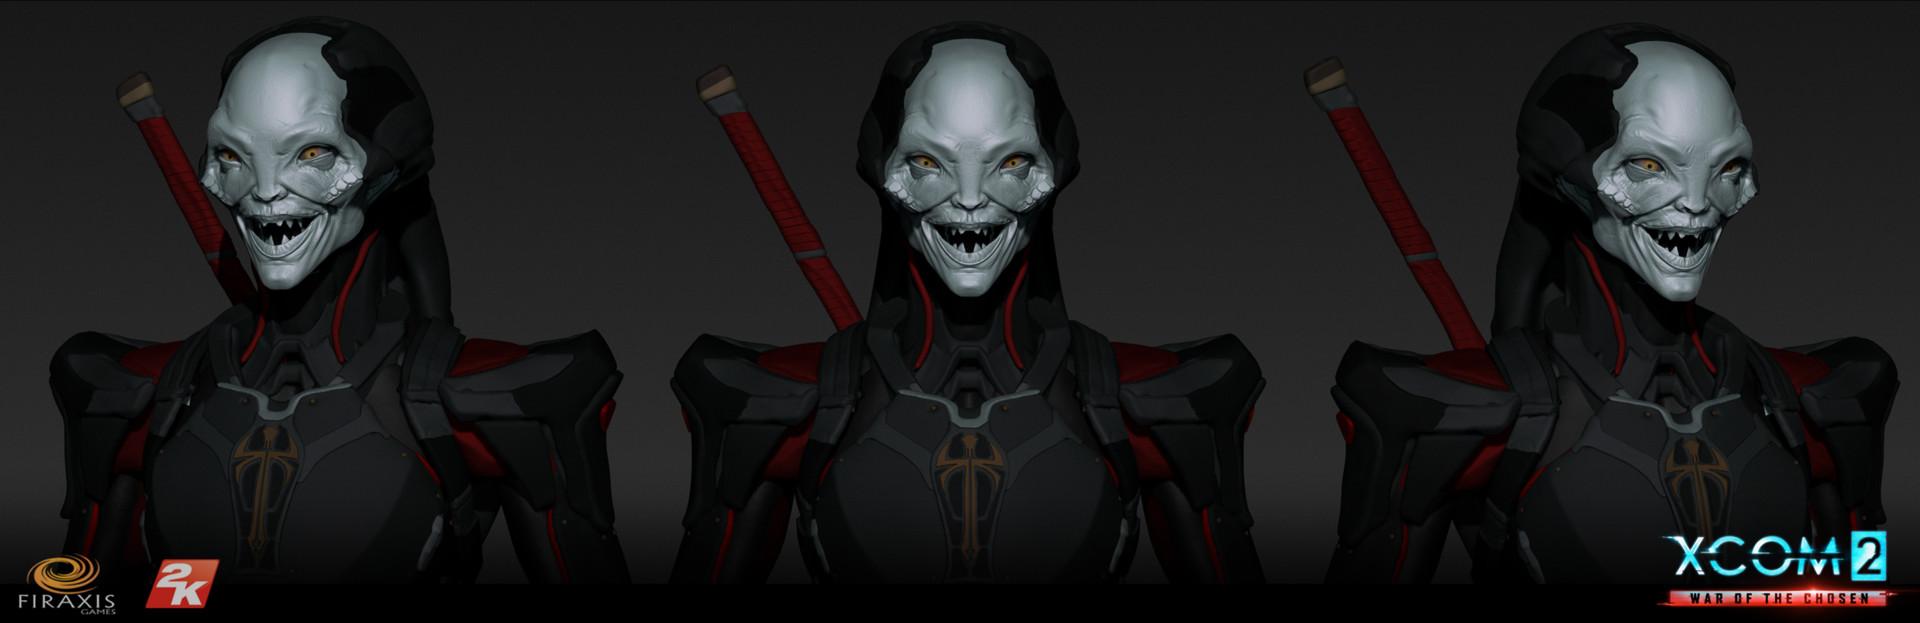 Matthew kean chosen assassin eexpressions smile